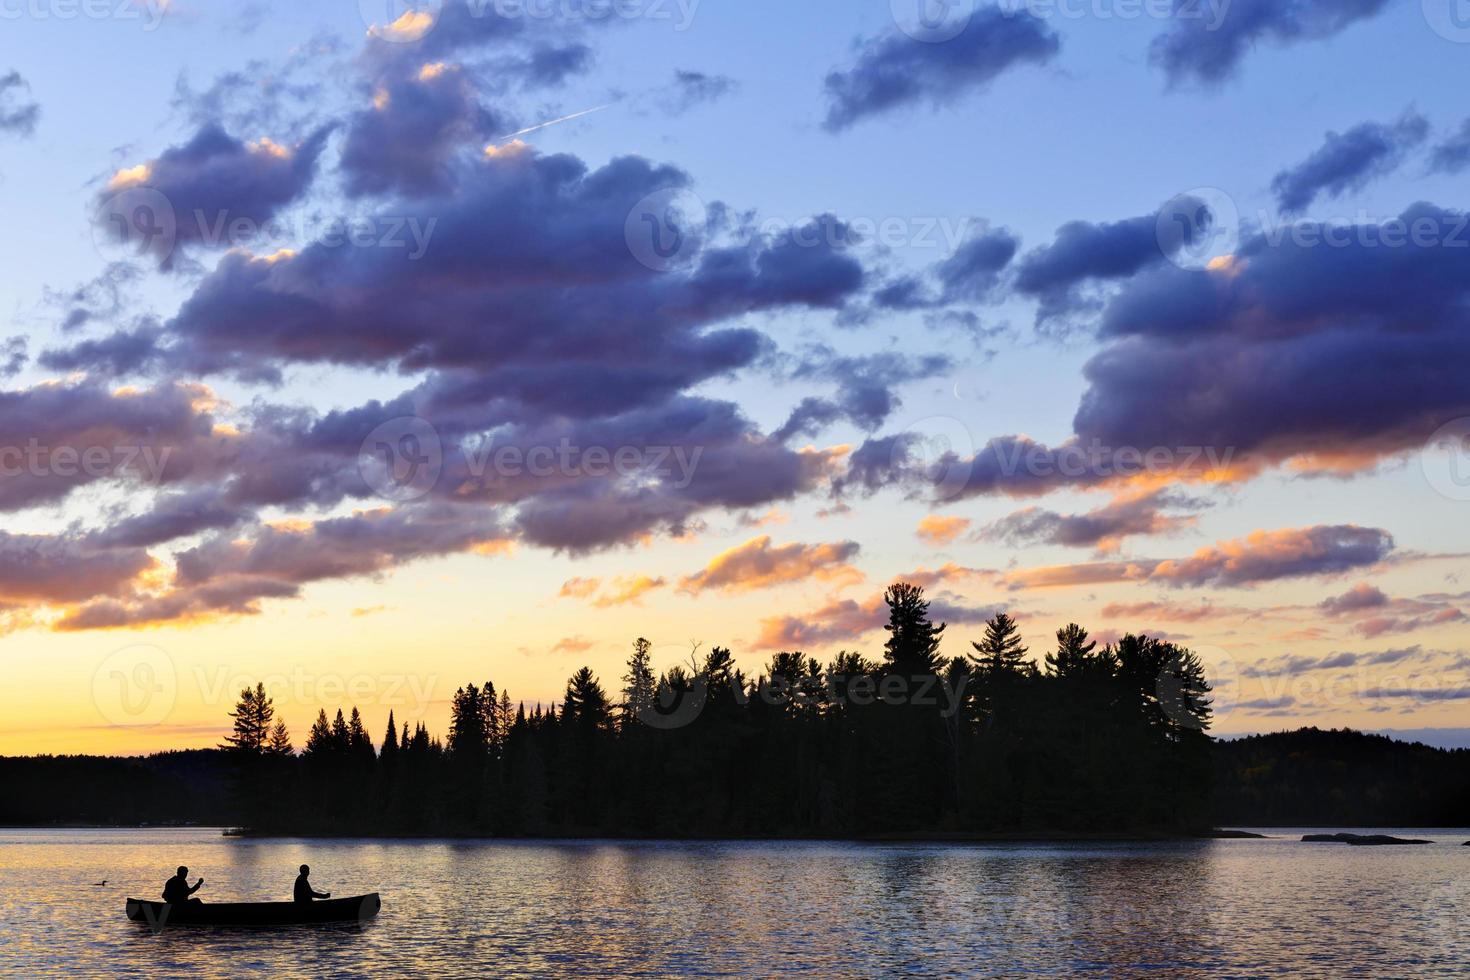 canoa no lago ao pôr do sol foto